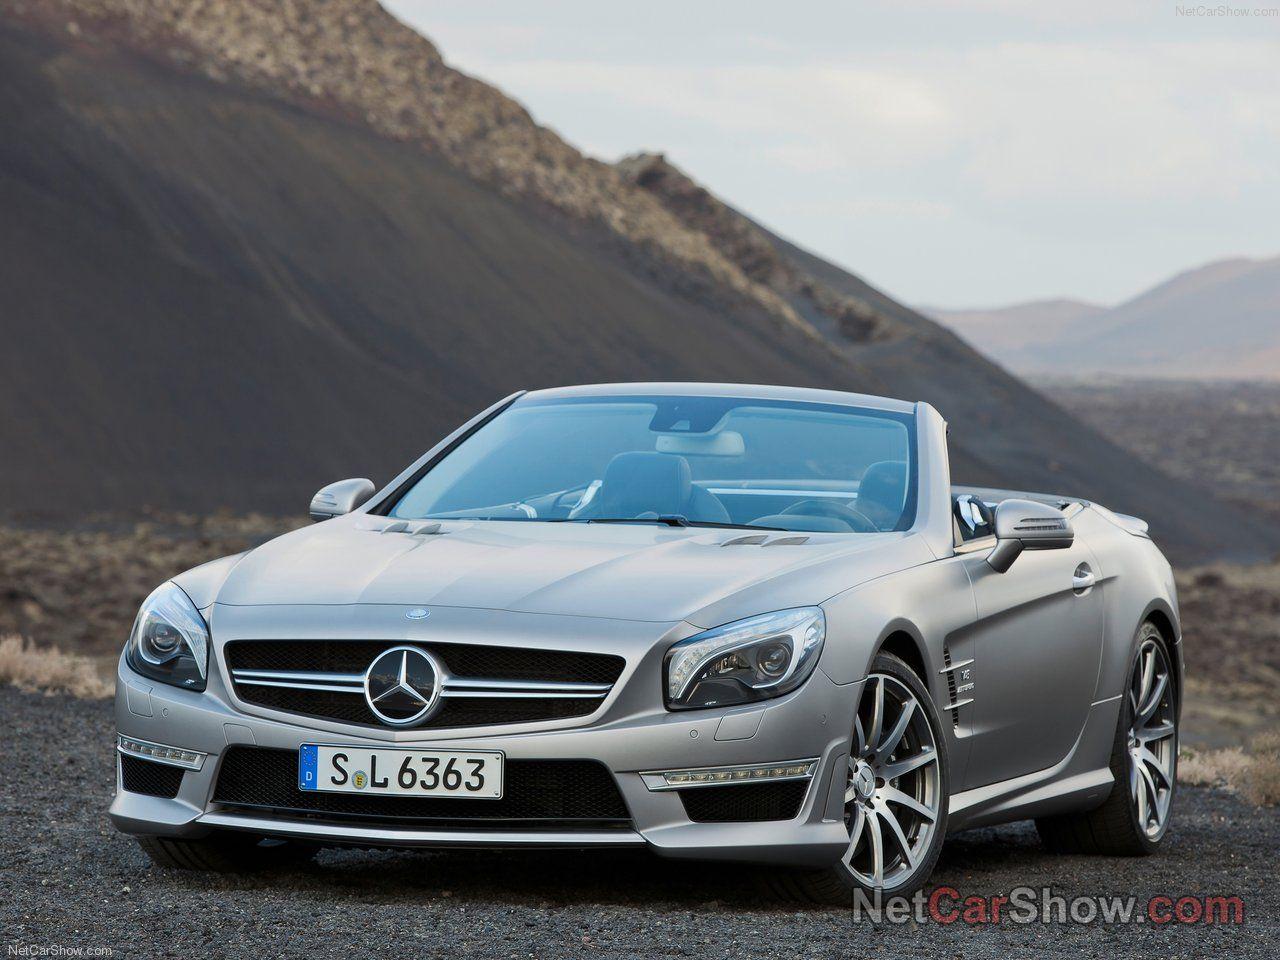 Mercedes Benz SL63 AMG (2013)